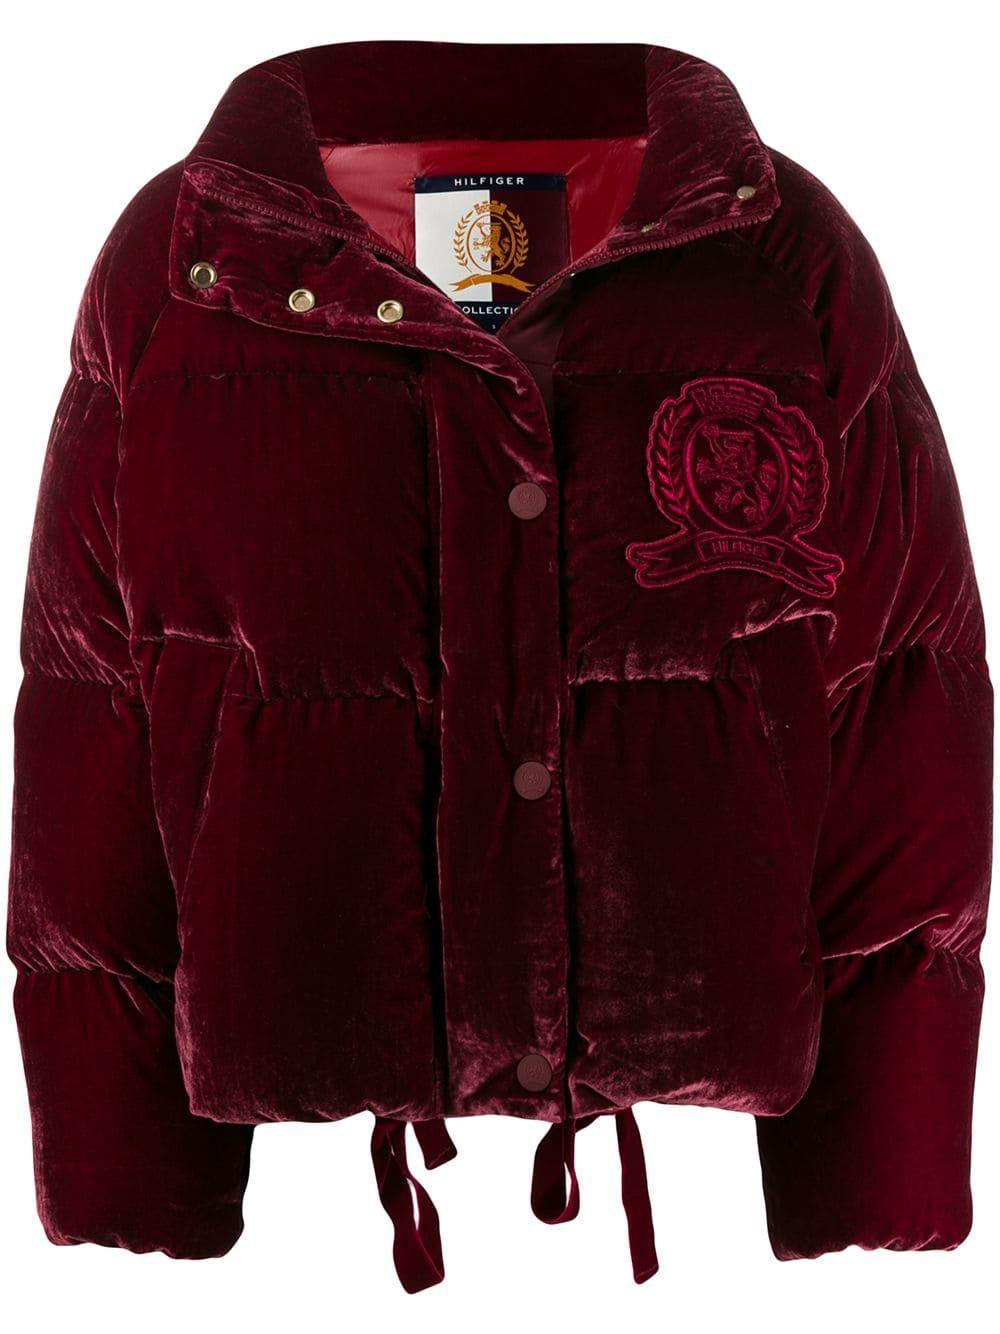 Hilfiger Collection Velvet Puffer Jacket Farfetch Womens Jumpsuits Casual Jackets Puffer Jackets [ 1334 x 1000 Pixel ]